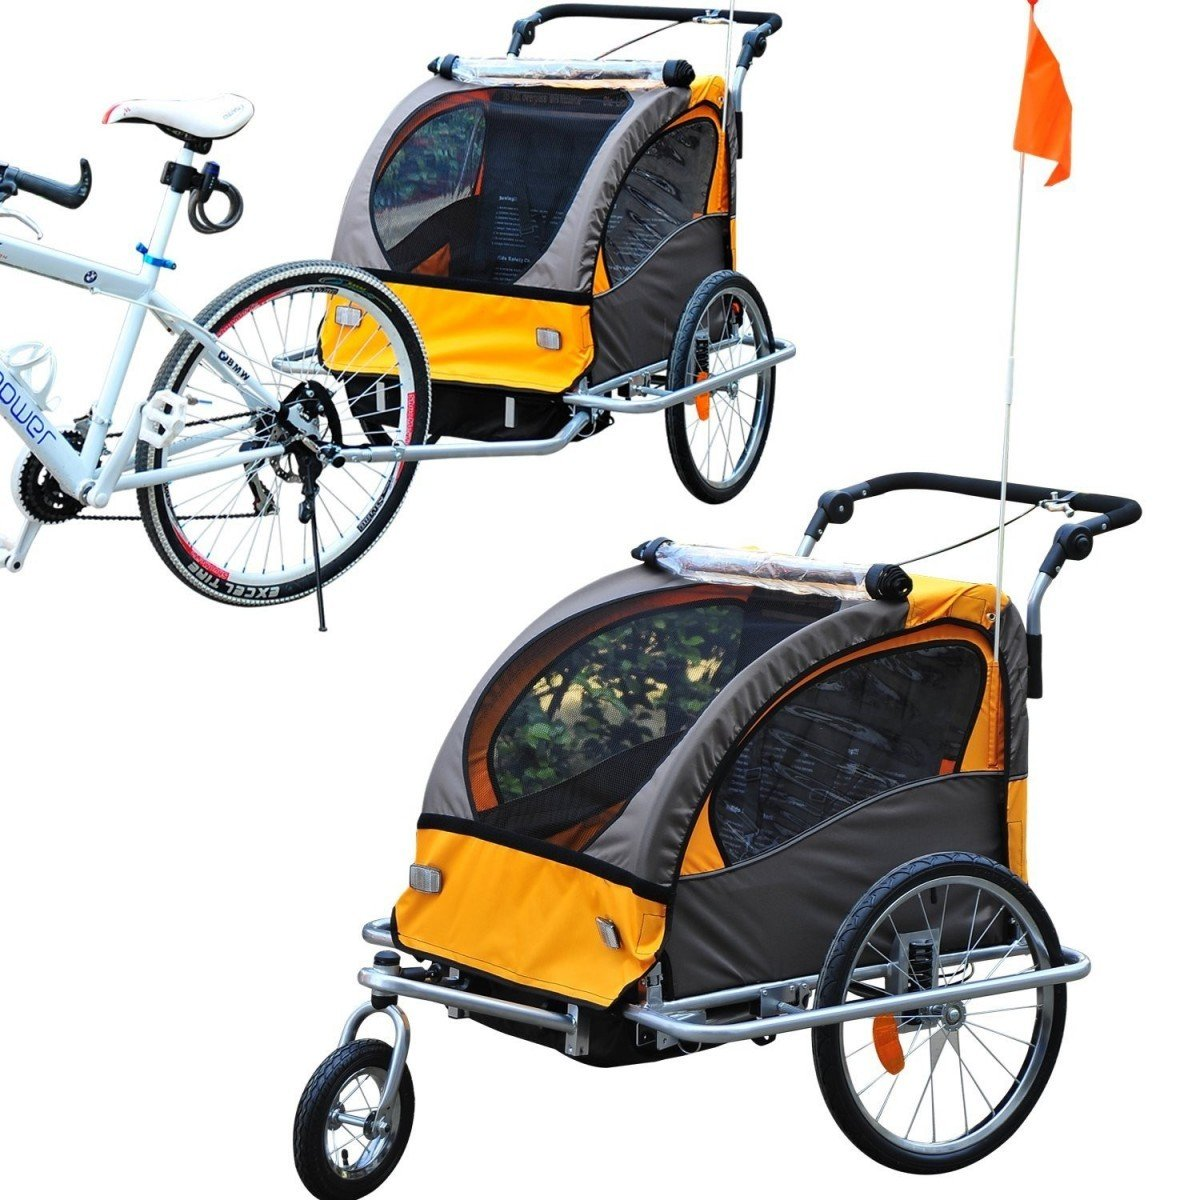 Trolley for children